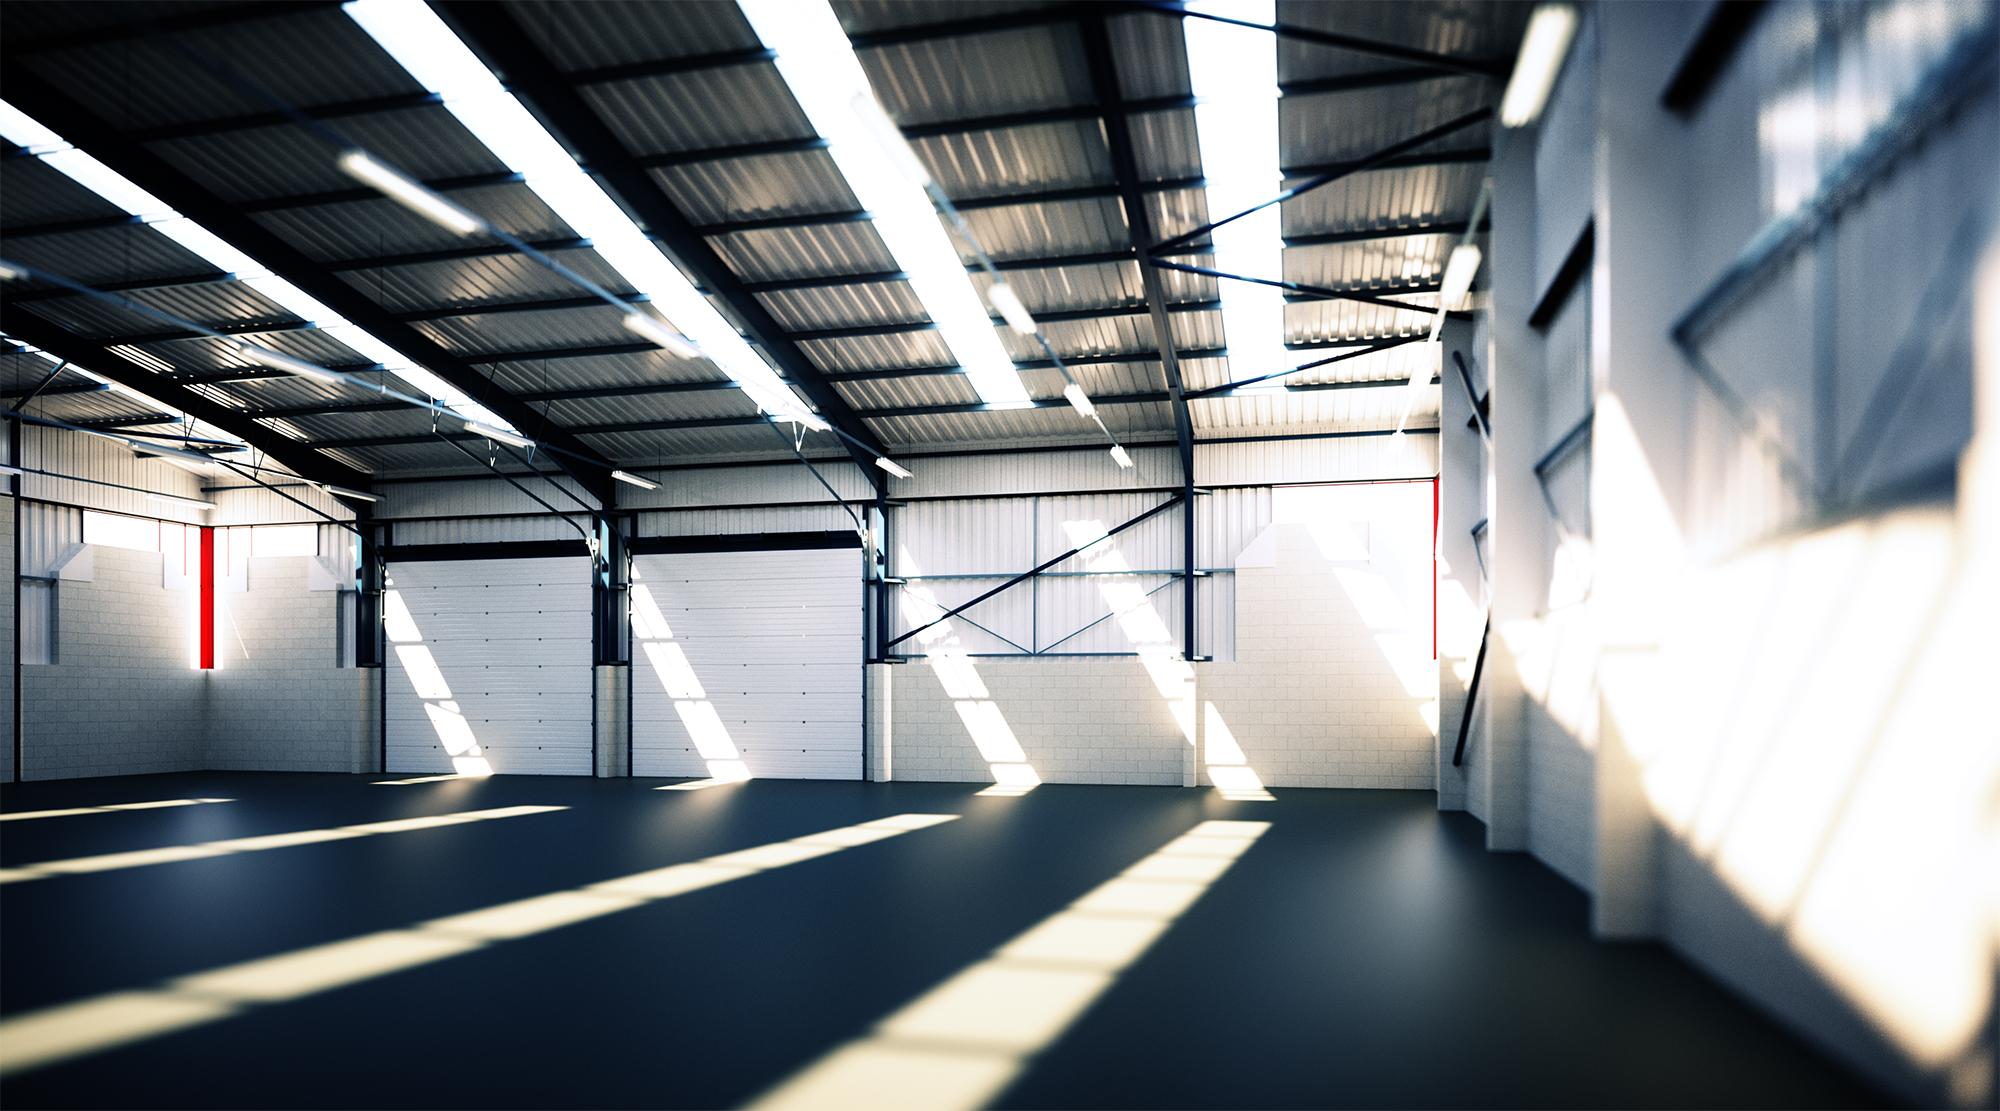 Counter-Projects-UK-Falmouth-Cornwall-CGI-Architectural-Visualisation-3d-Illustration-Warehouse.jpg